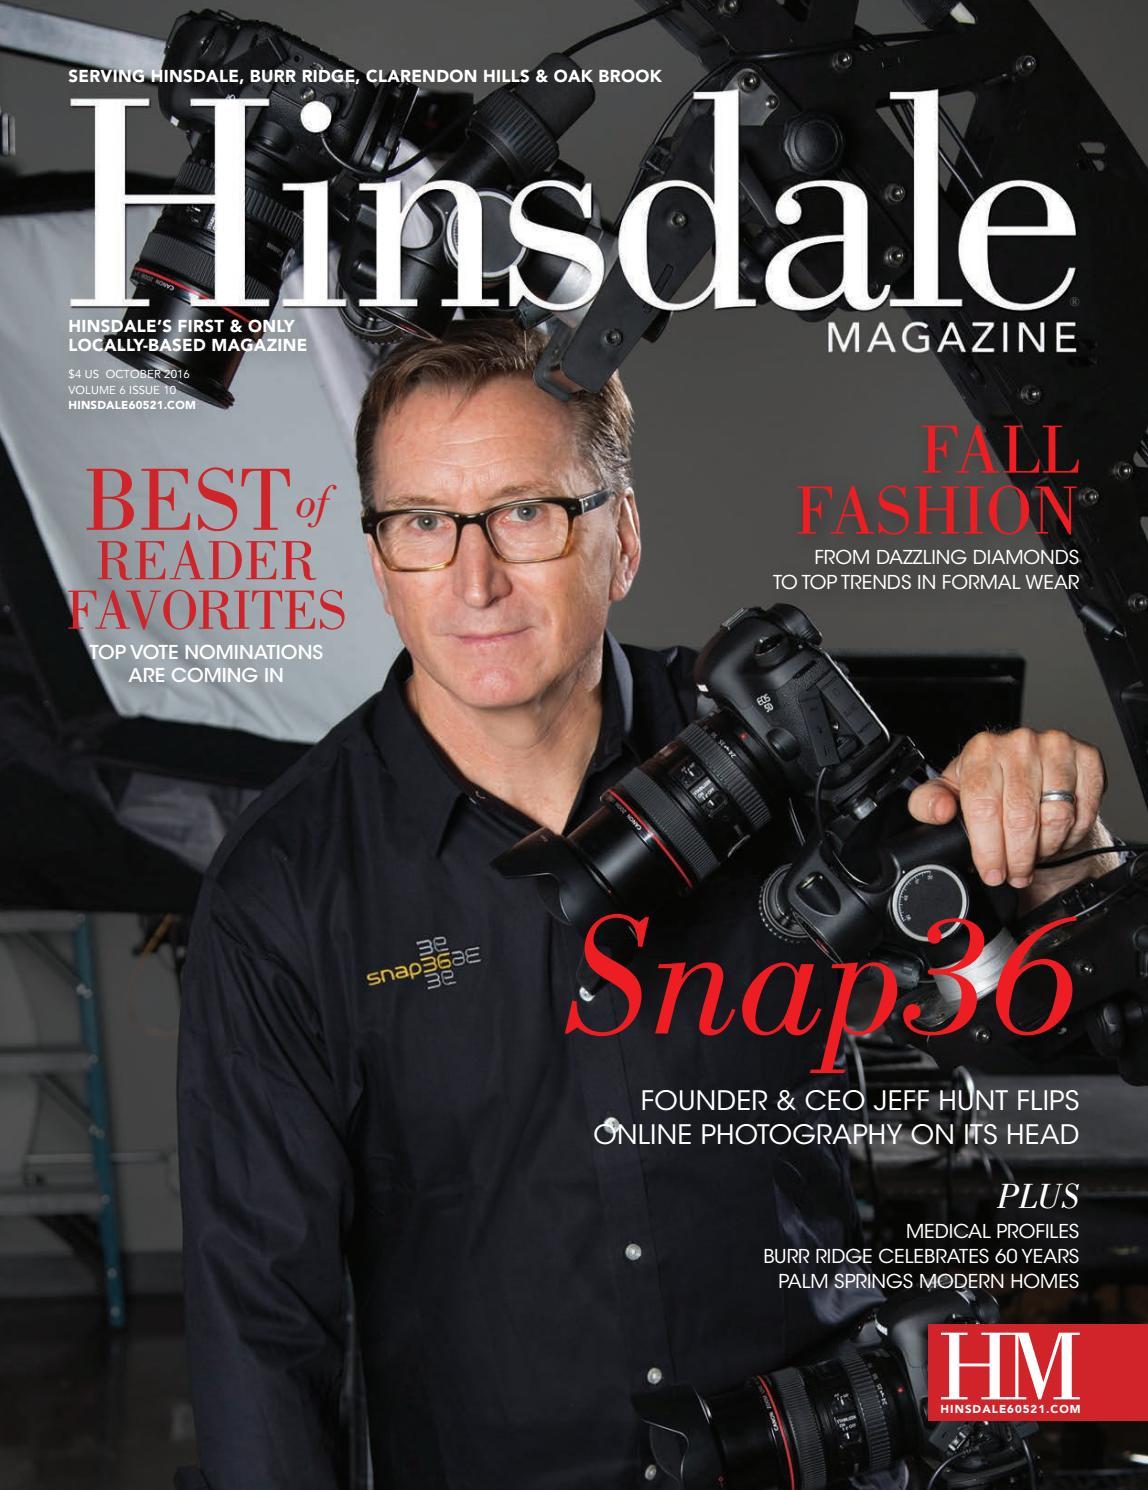 Hinsdale Magazine November 2016 by www.Hinsdale60521.com - issuu